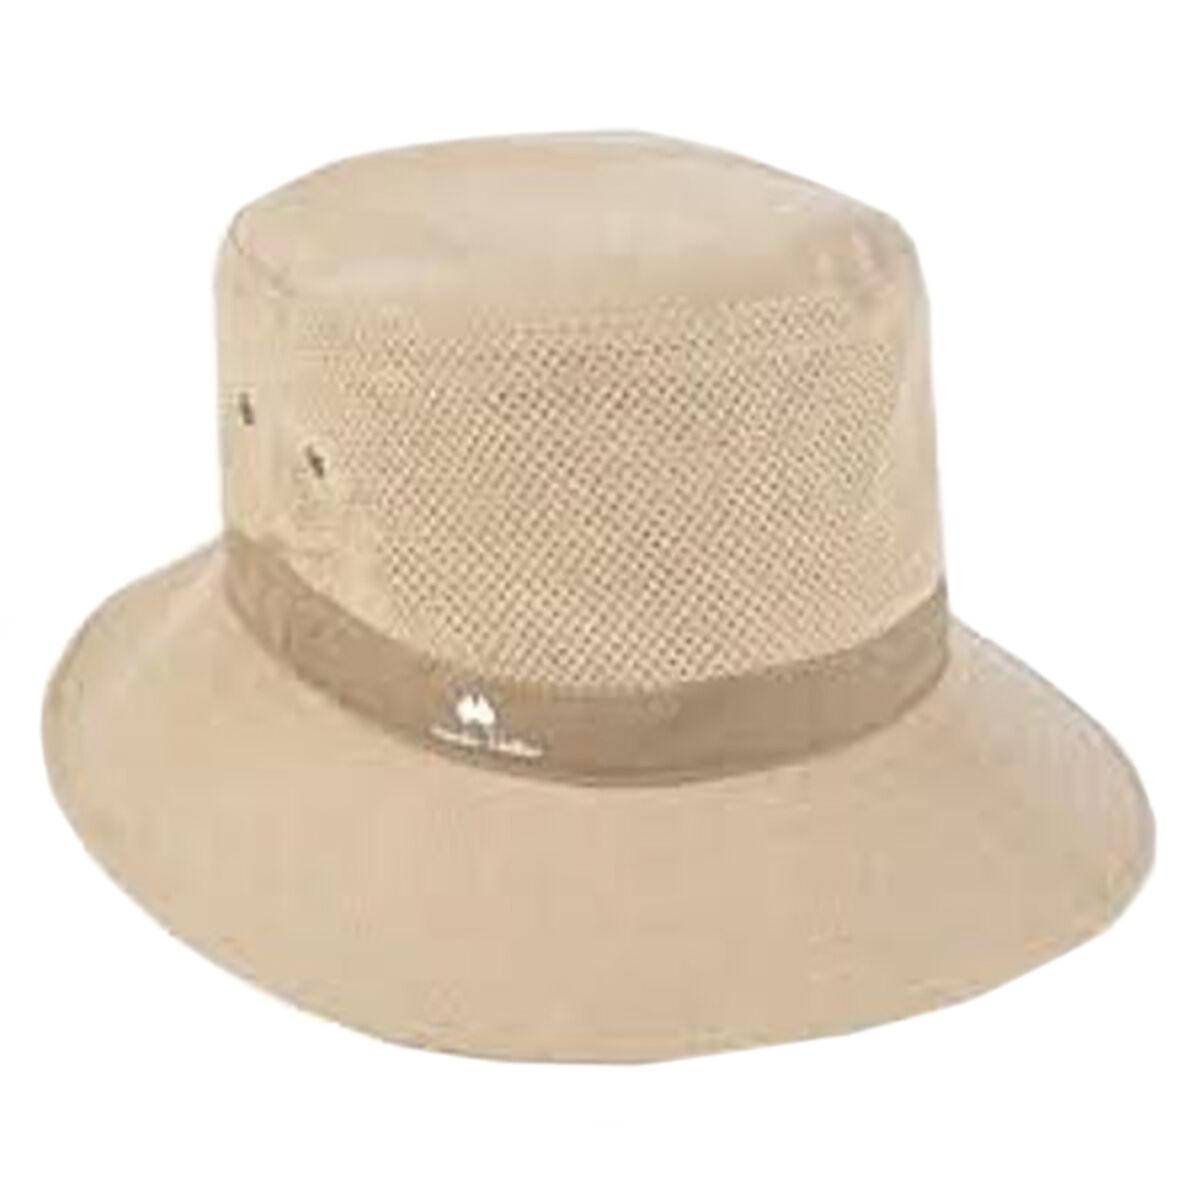 Shop Aussie Chiller Bucket Perforated Hat- Blonde  2984e2e5b18